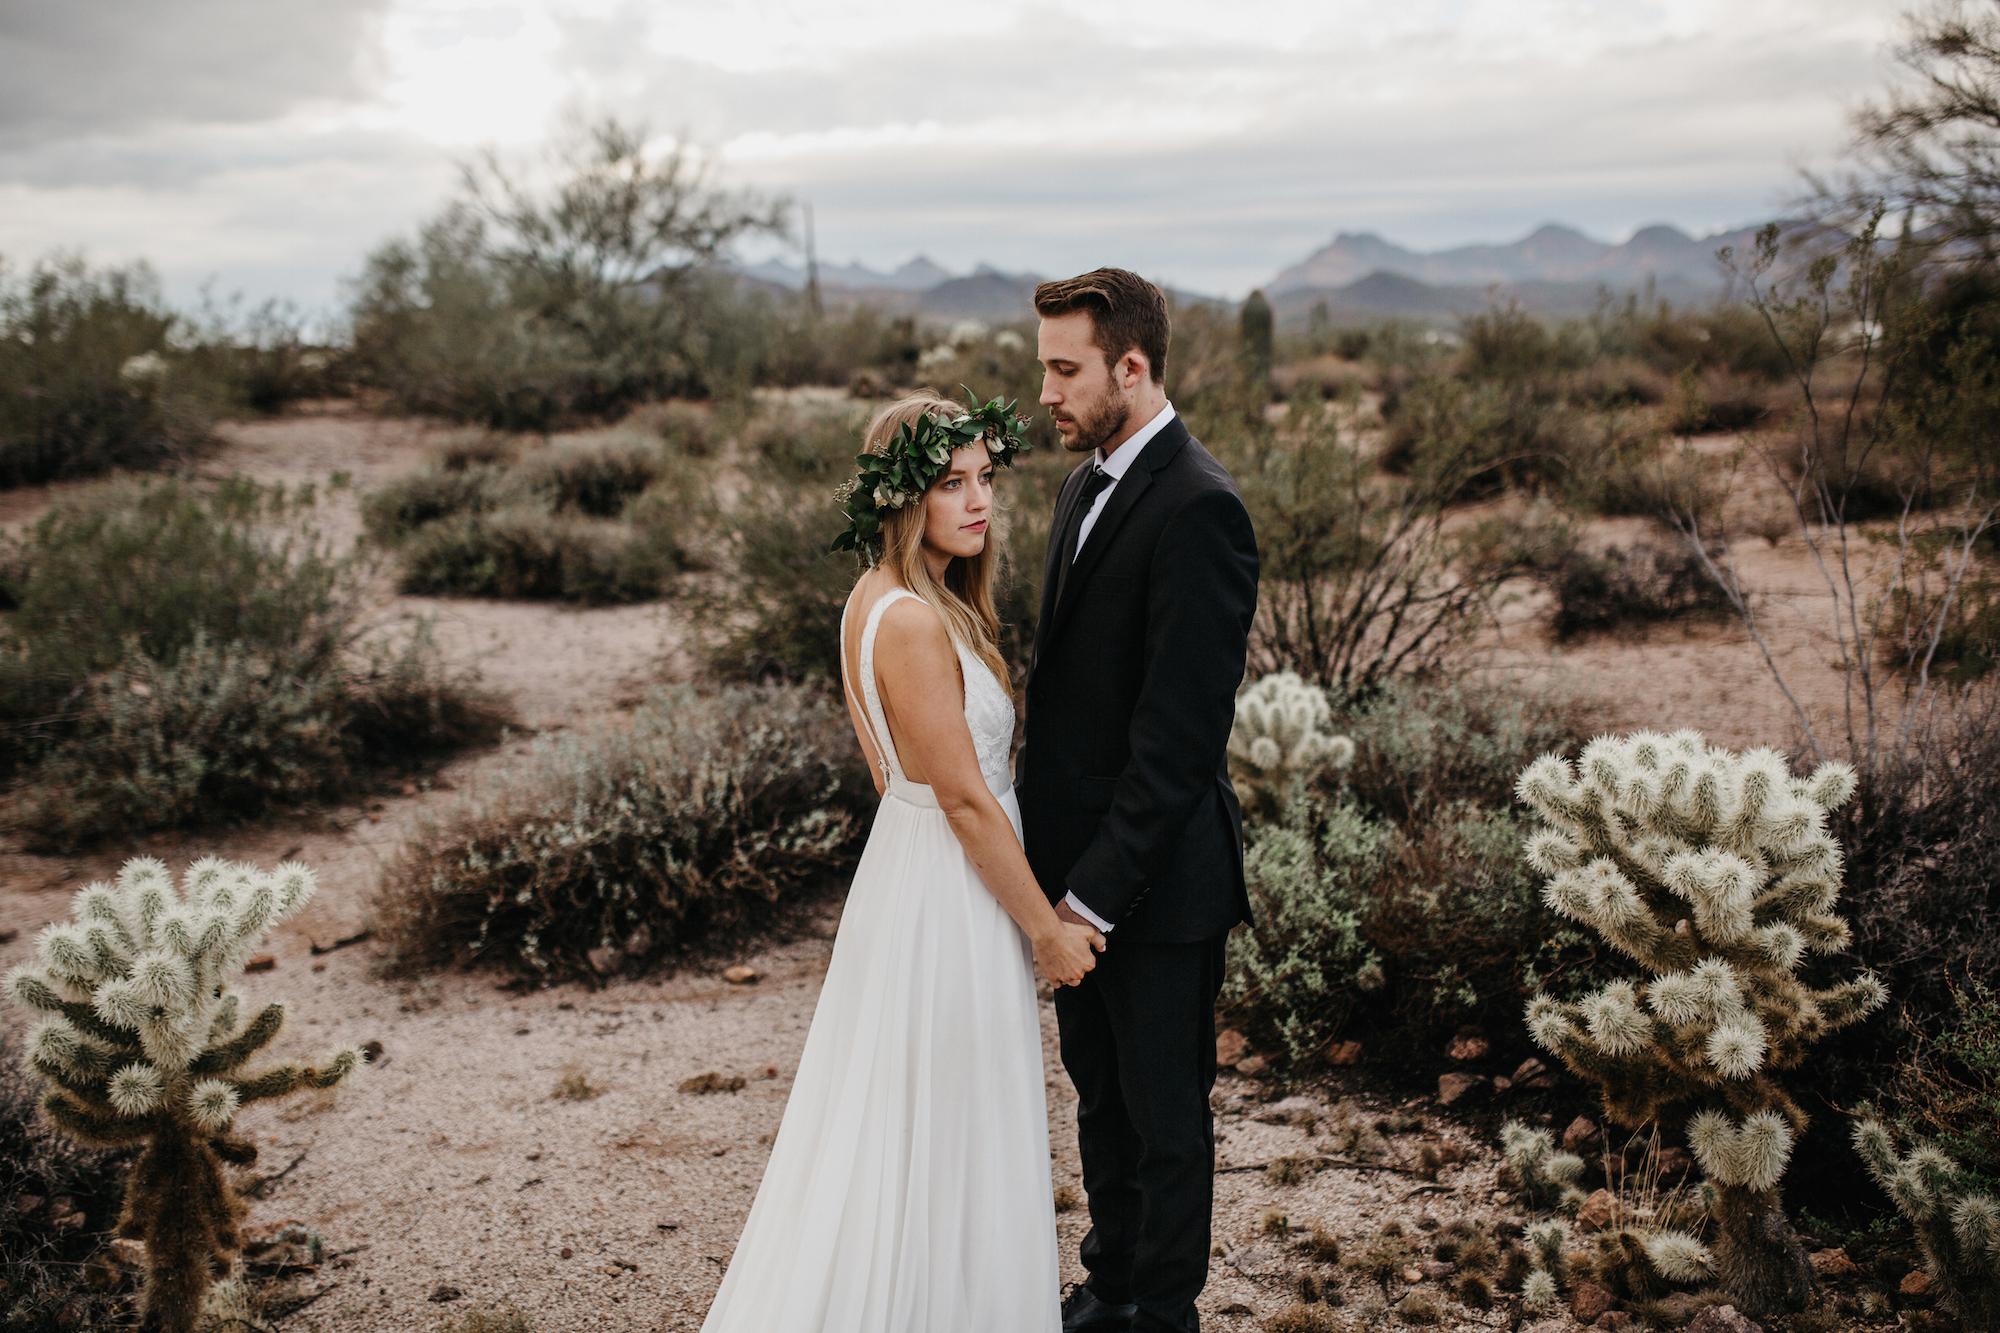 arizona - wedding - photographer744.jpg